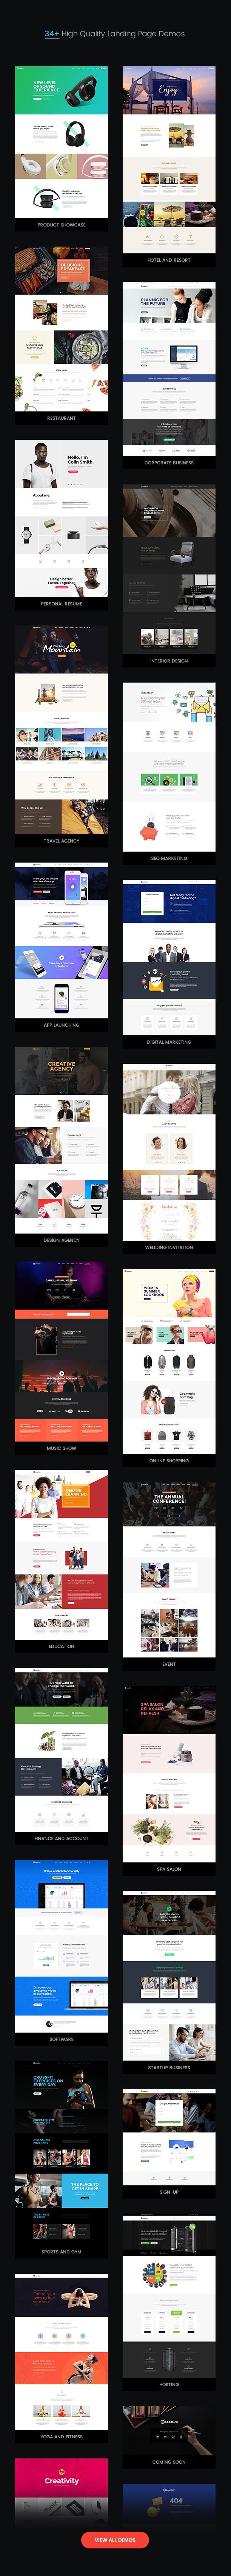 leadgen awesome stylish demos v3 - LeadGen - Multipurpose Marketing Landing Page Pack with HTML Builder